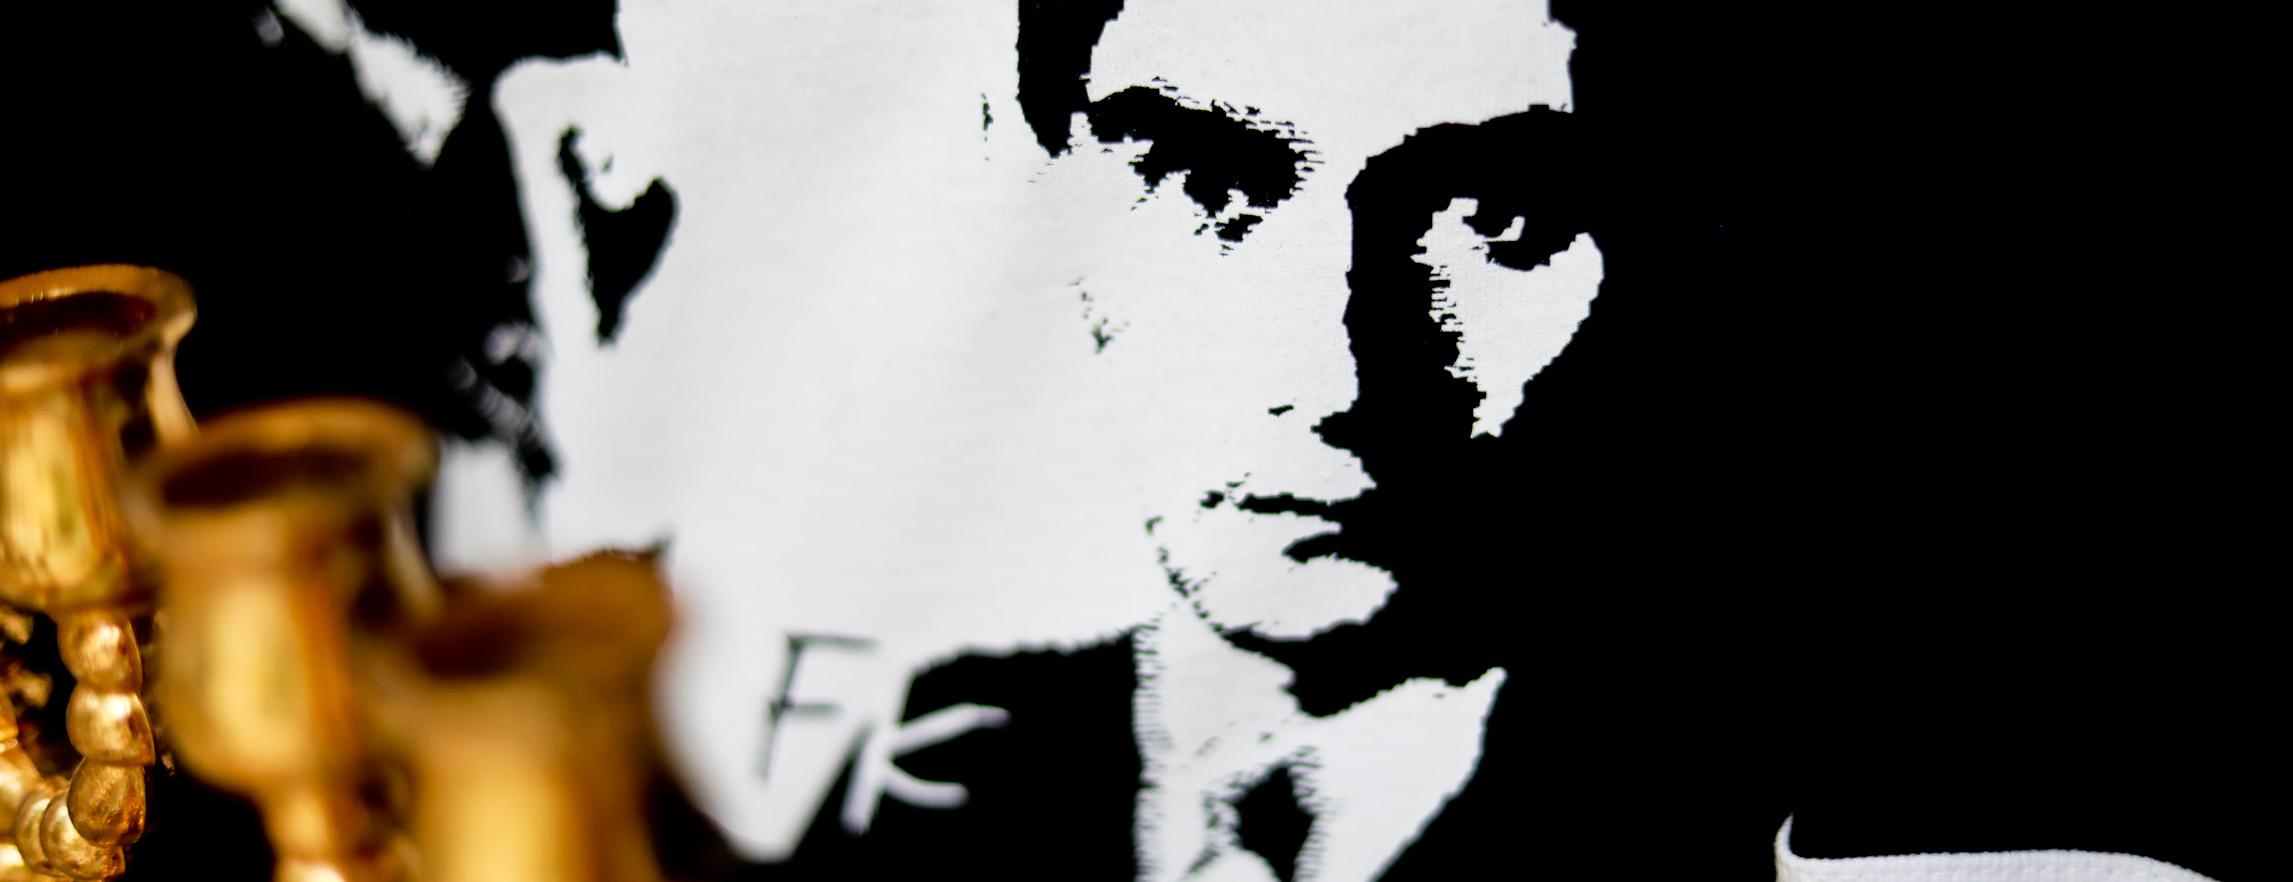 Franz Kafka v #JEWISHOP